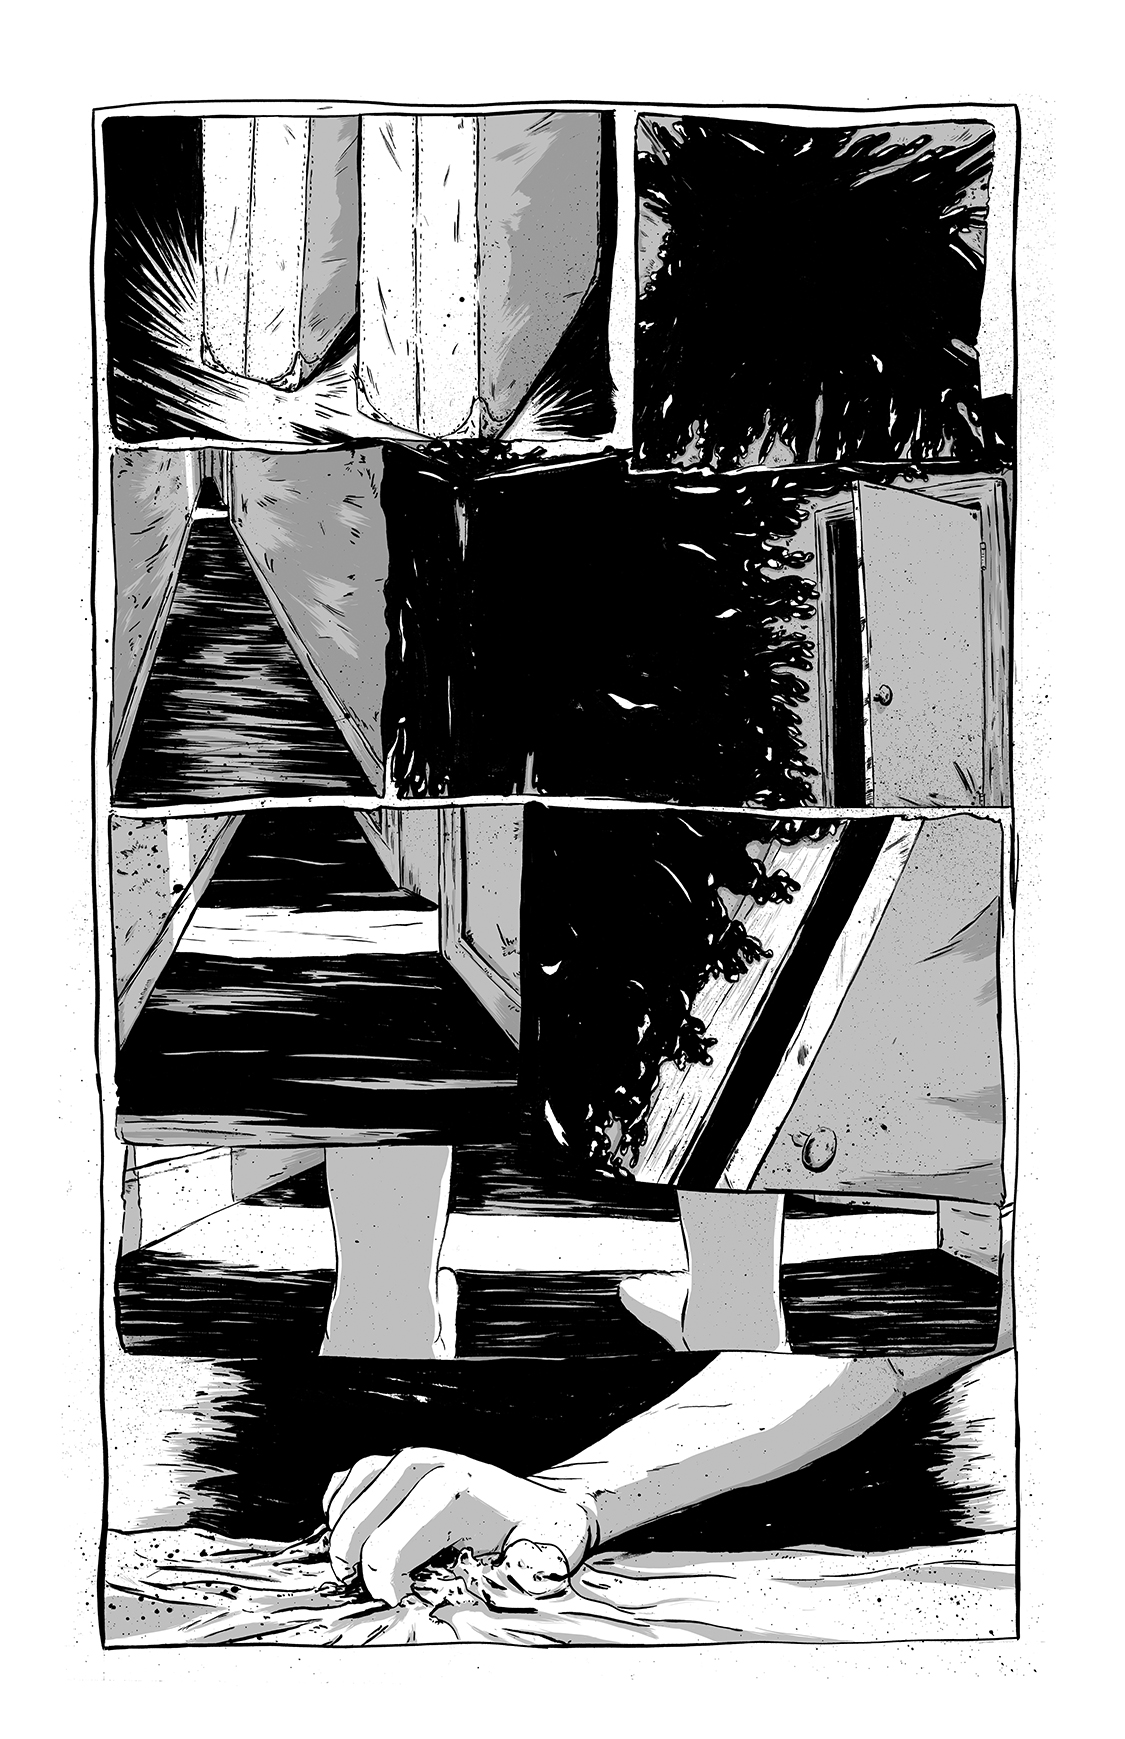 Eight Days Alone, page 6, by Sam Costello and Matthew Goik